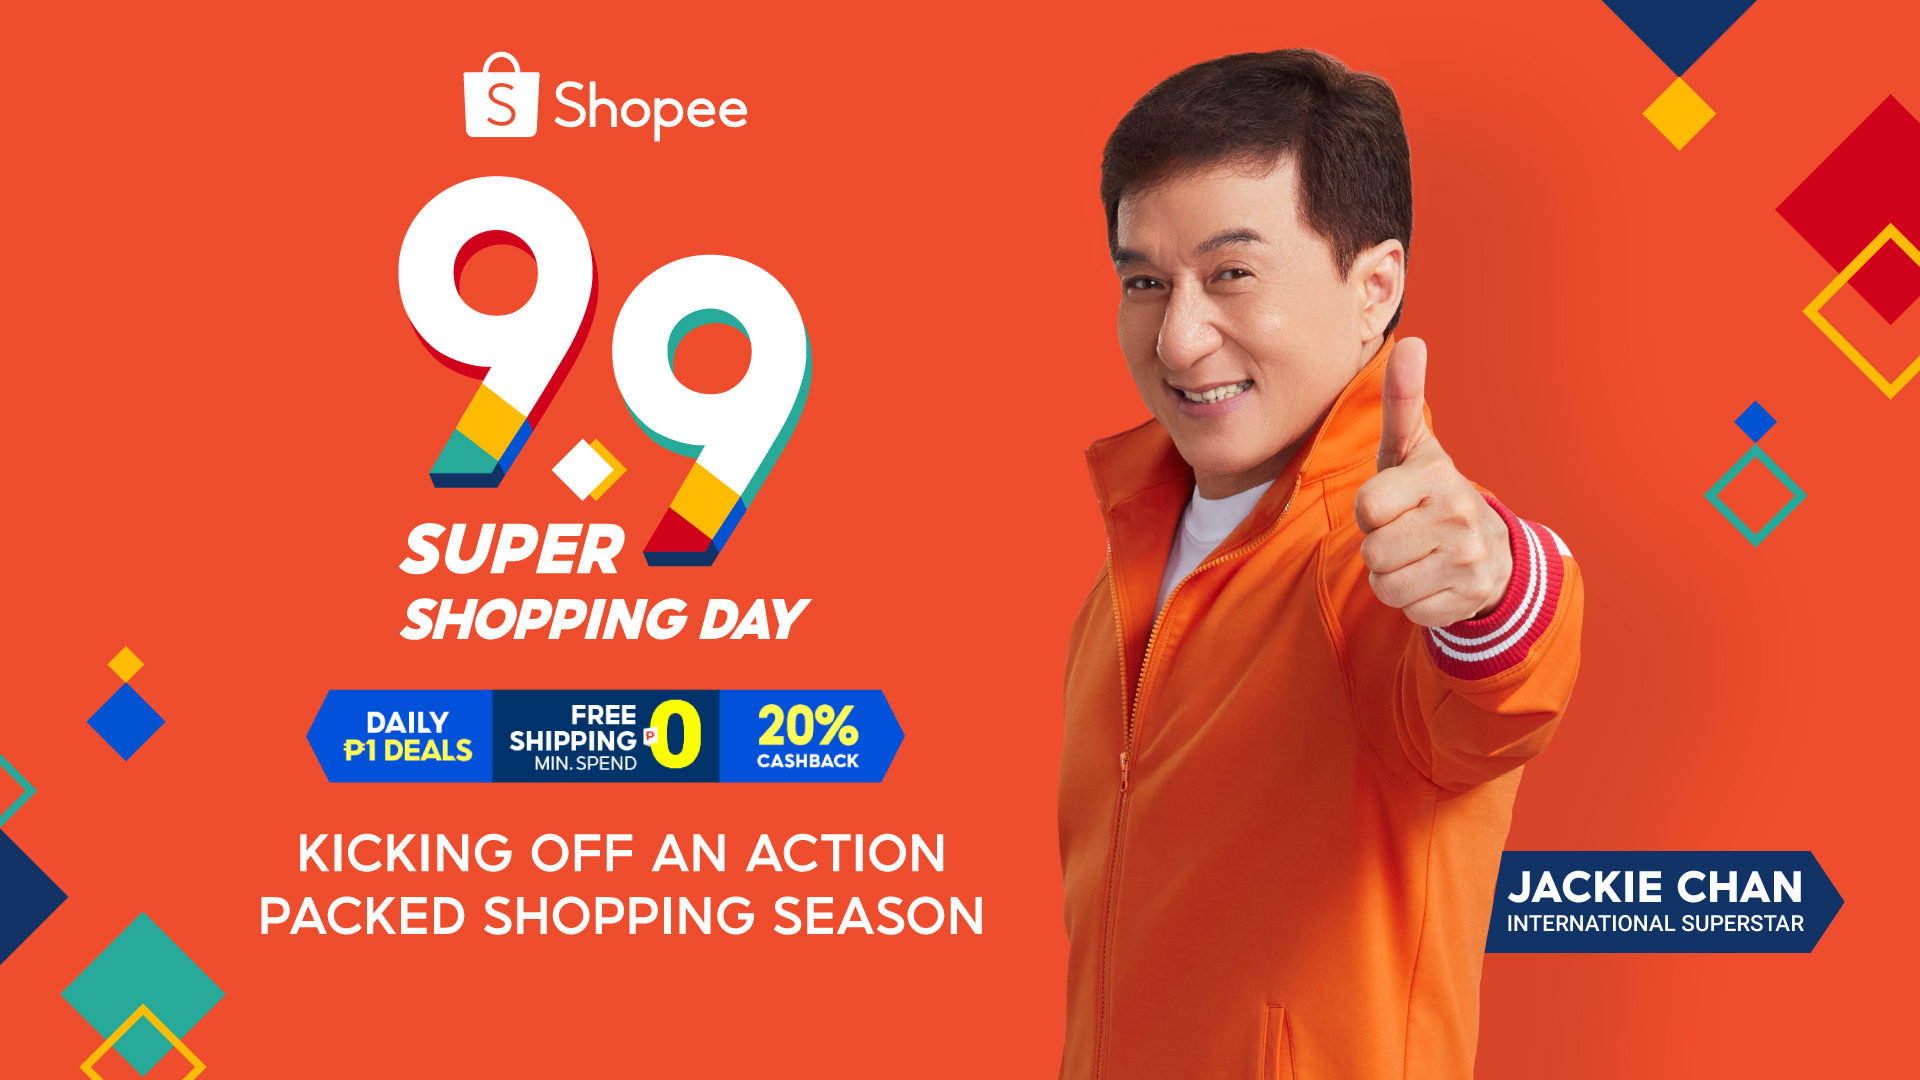 Jackie Chan, Shopee Celebrity Ambassador for 9.9 Super Shopping Day